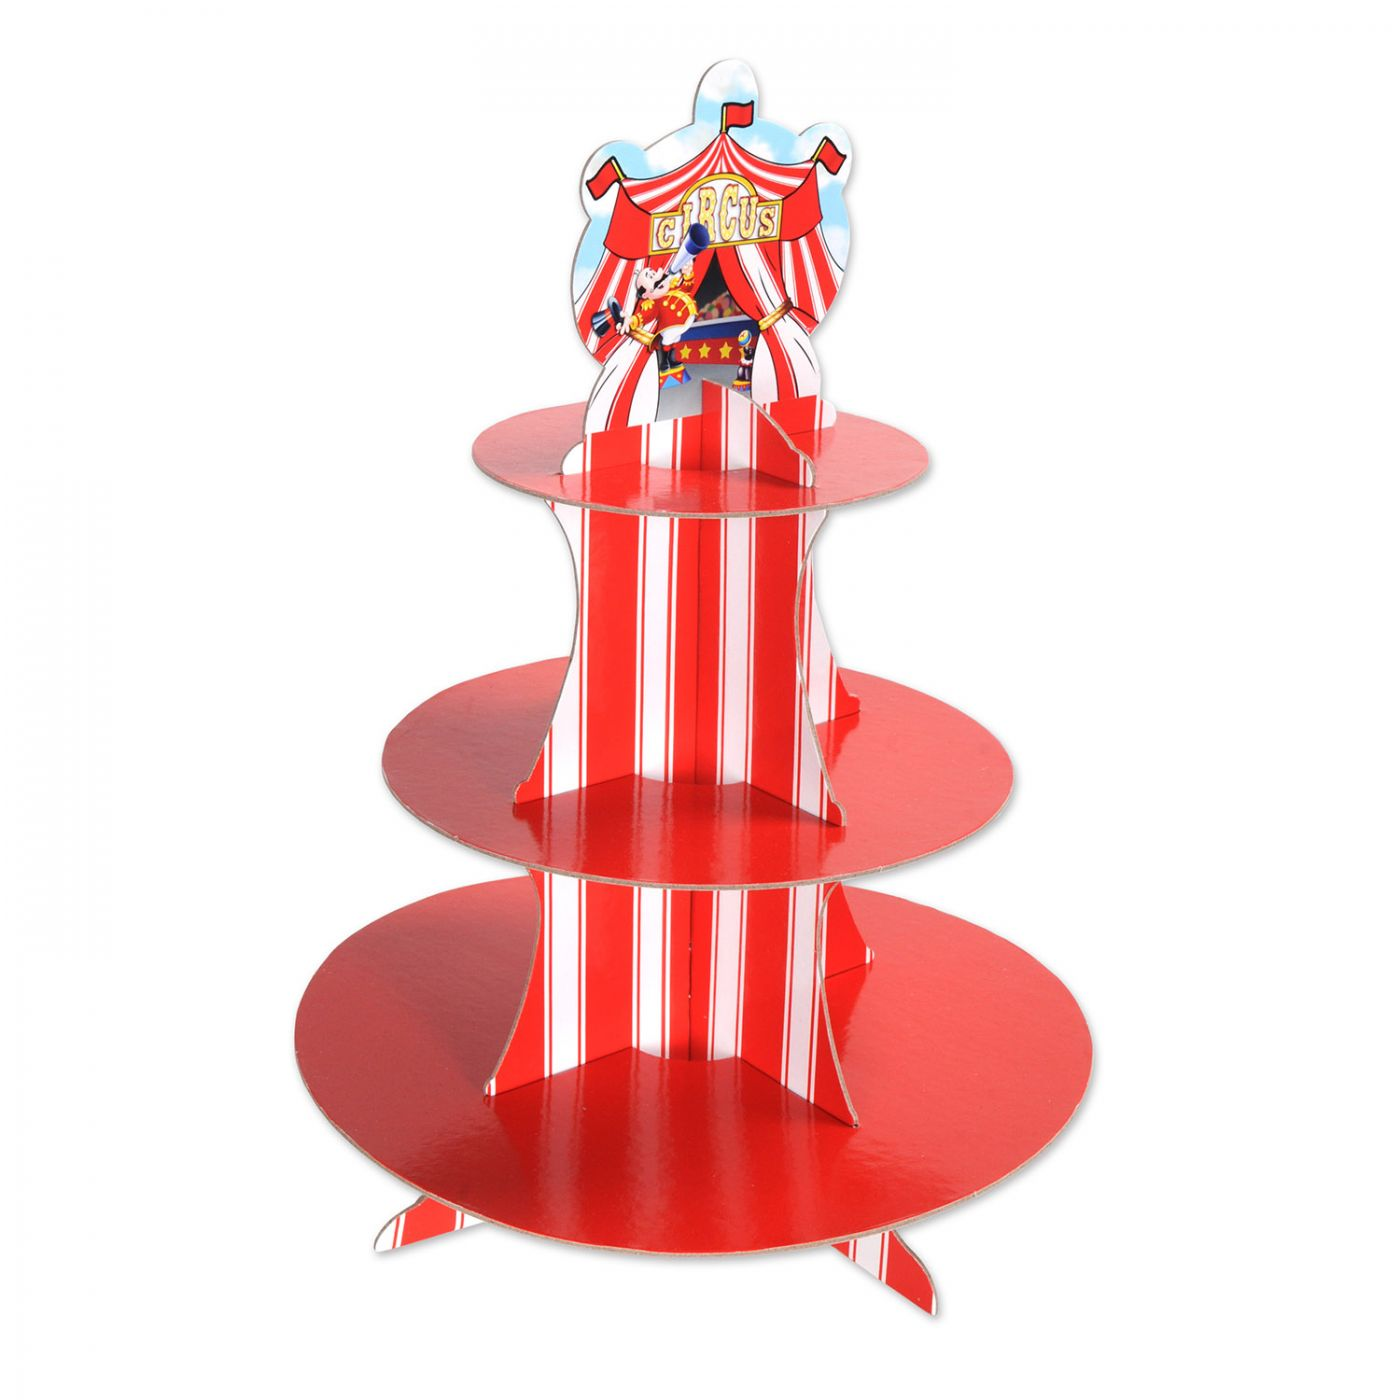 Circus Tent Cupcake Stand image